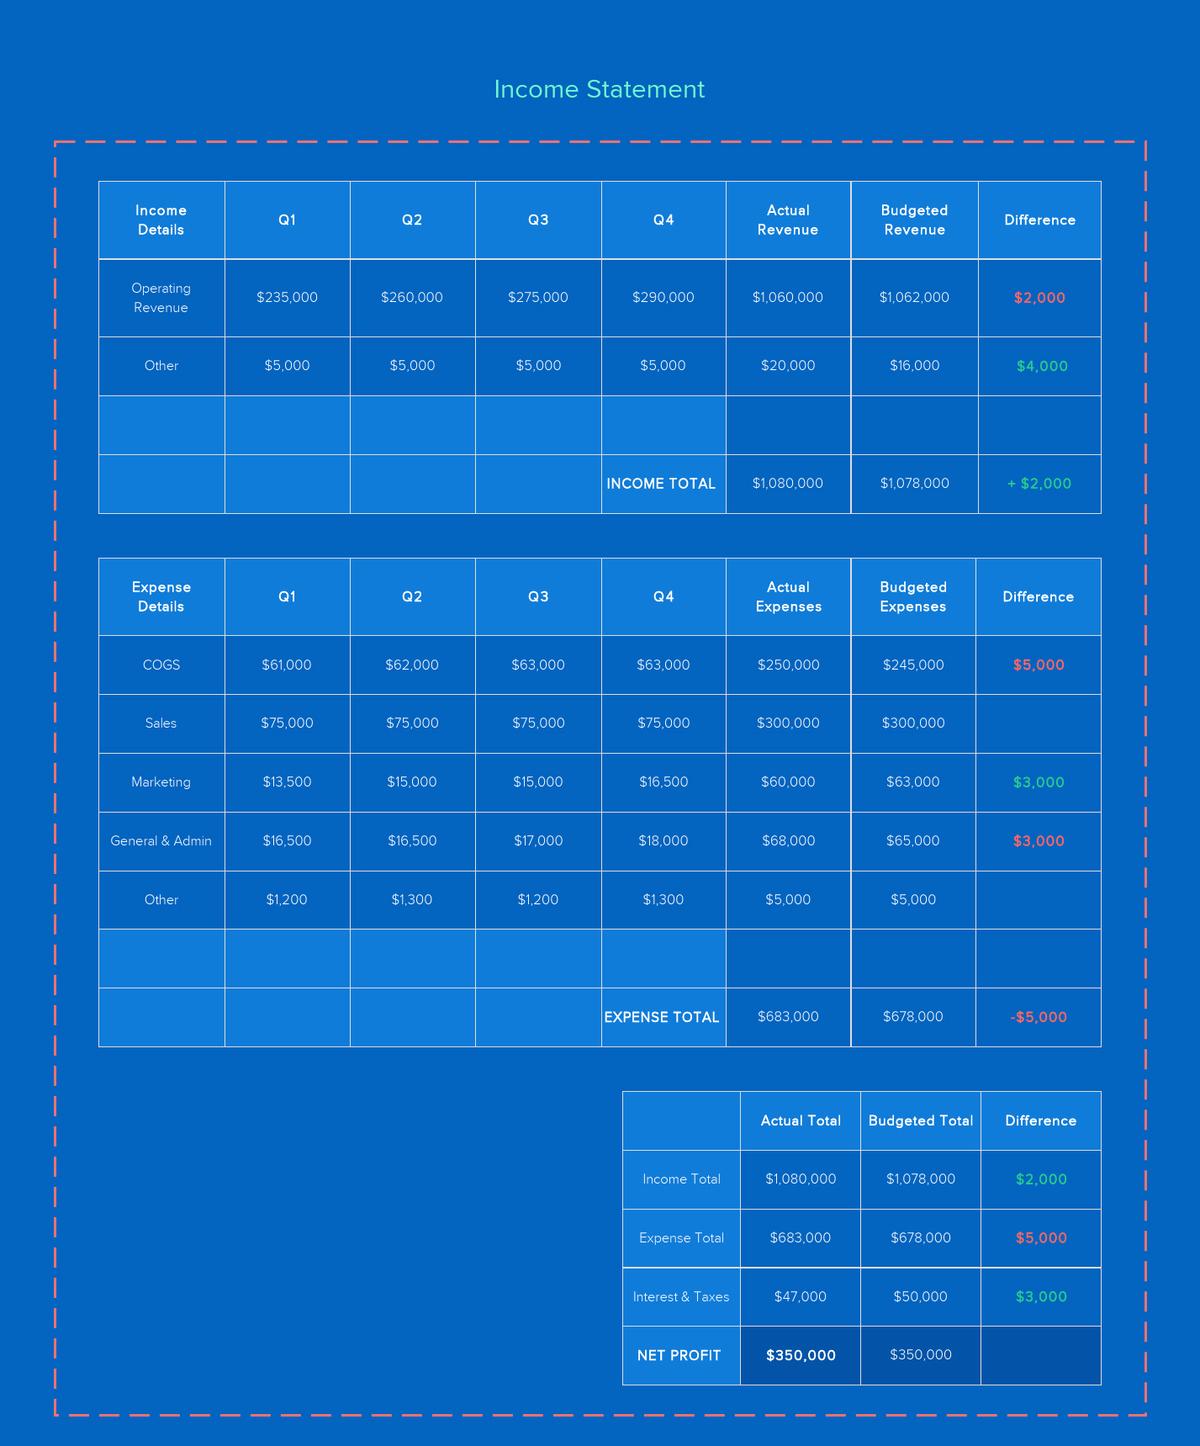 Annual Budget Report | Xtensio